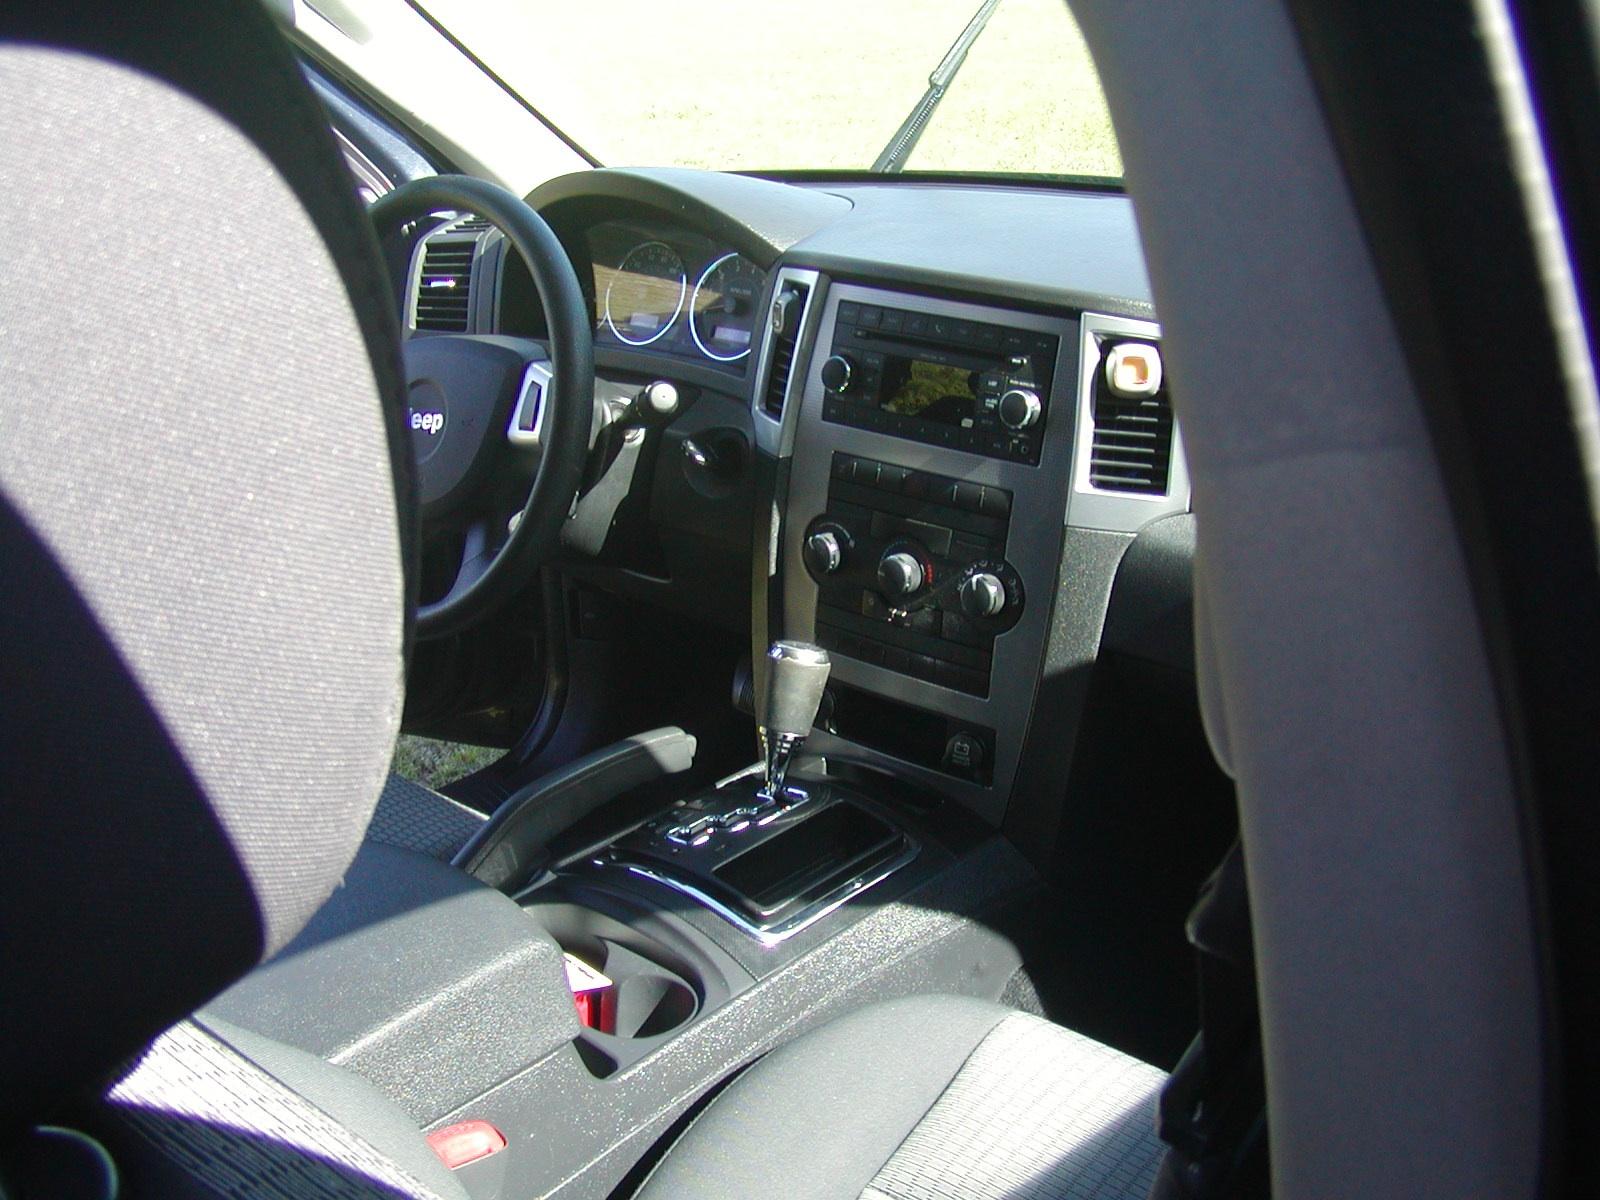 2008 jeep grand cherokee interior pictures cargurus for 2008 jeep grand cherokee interior